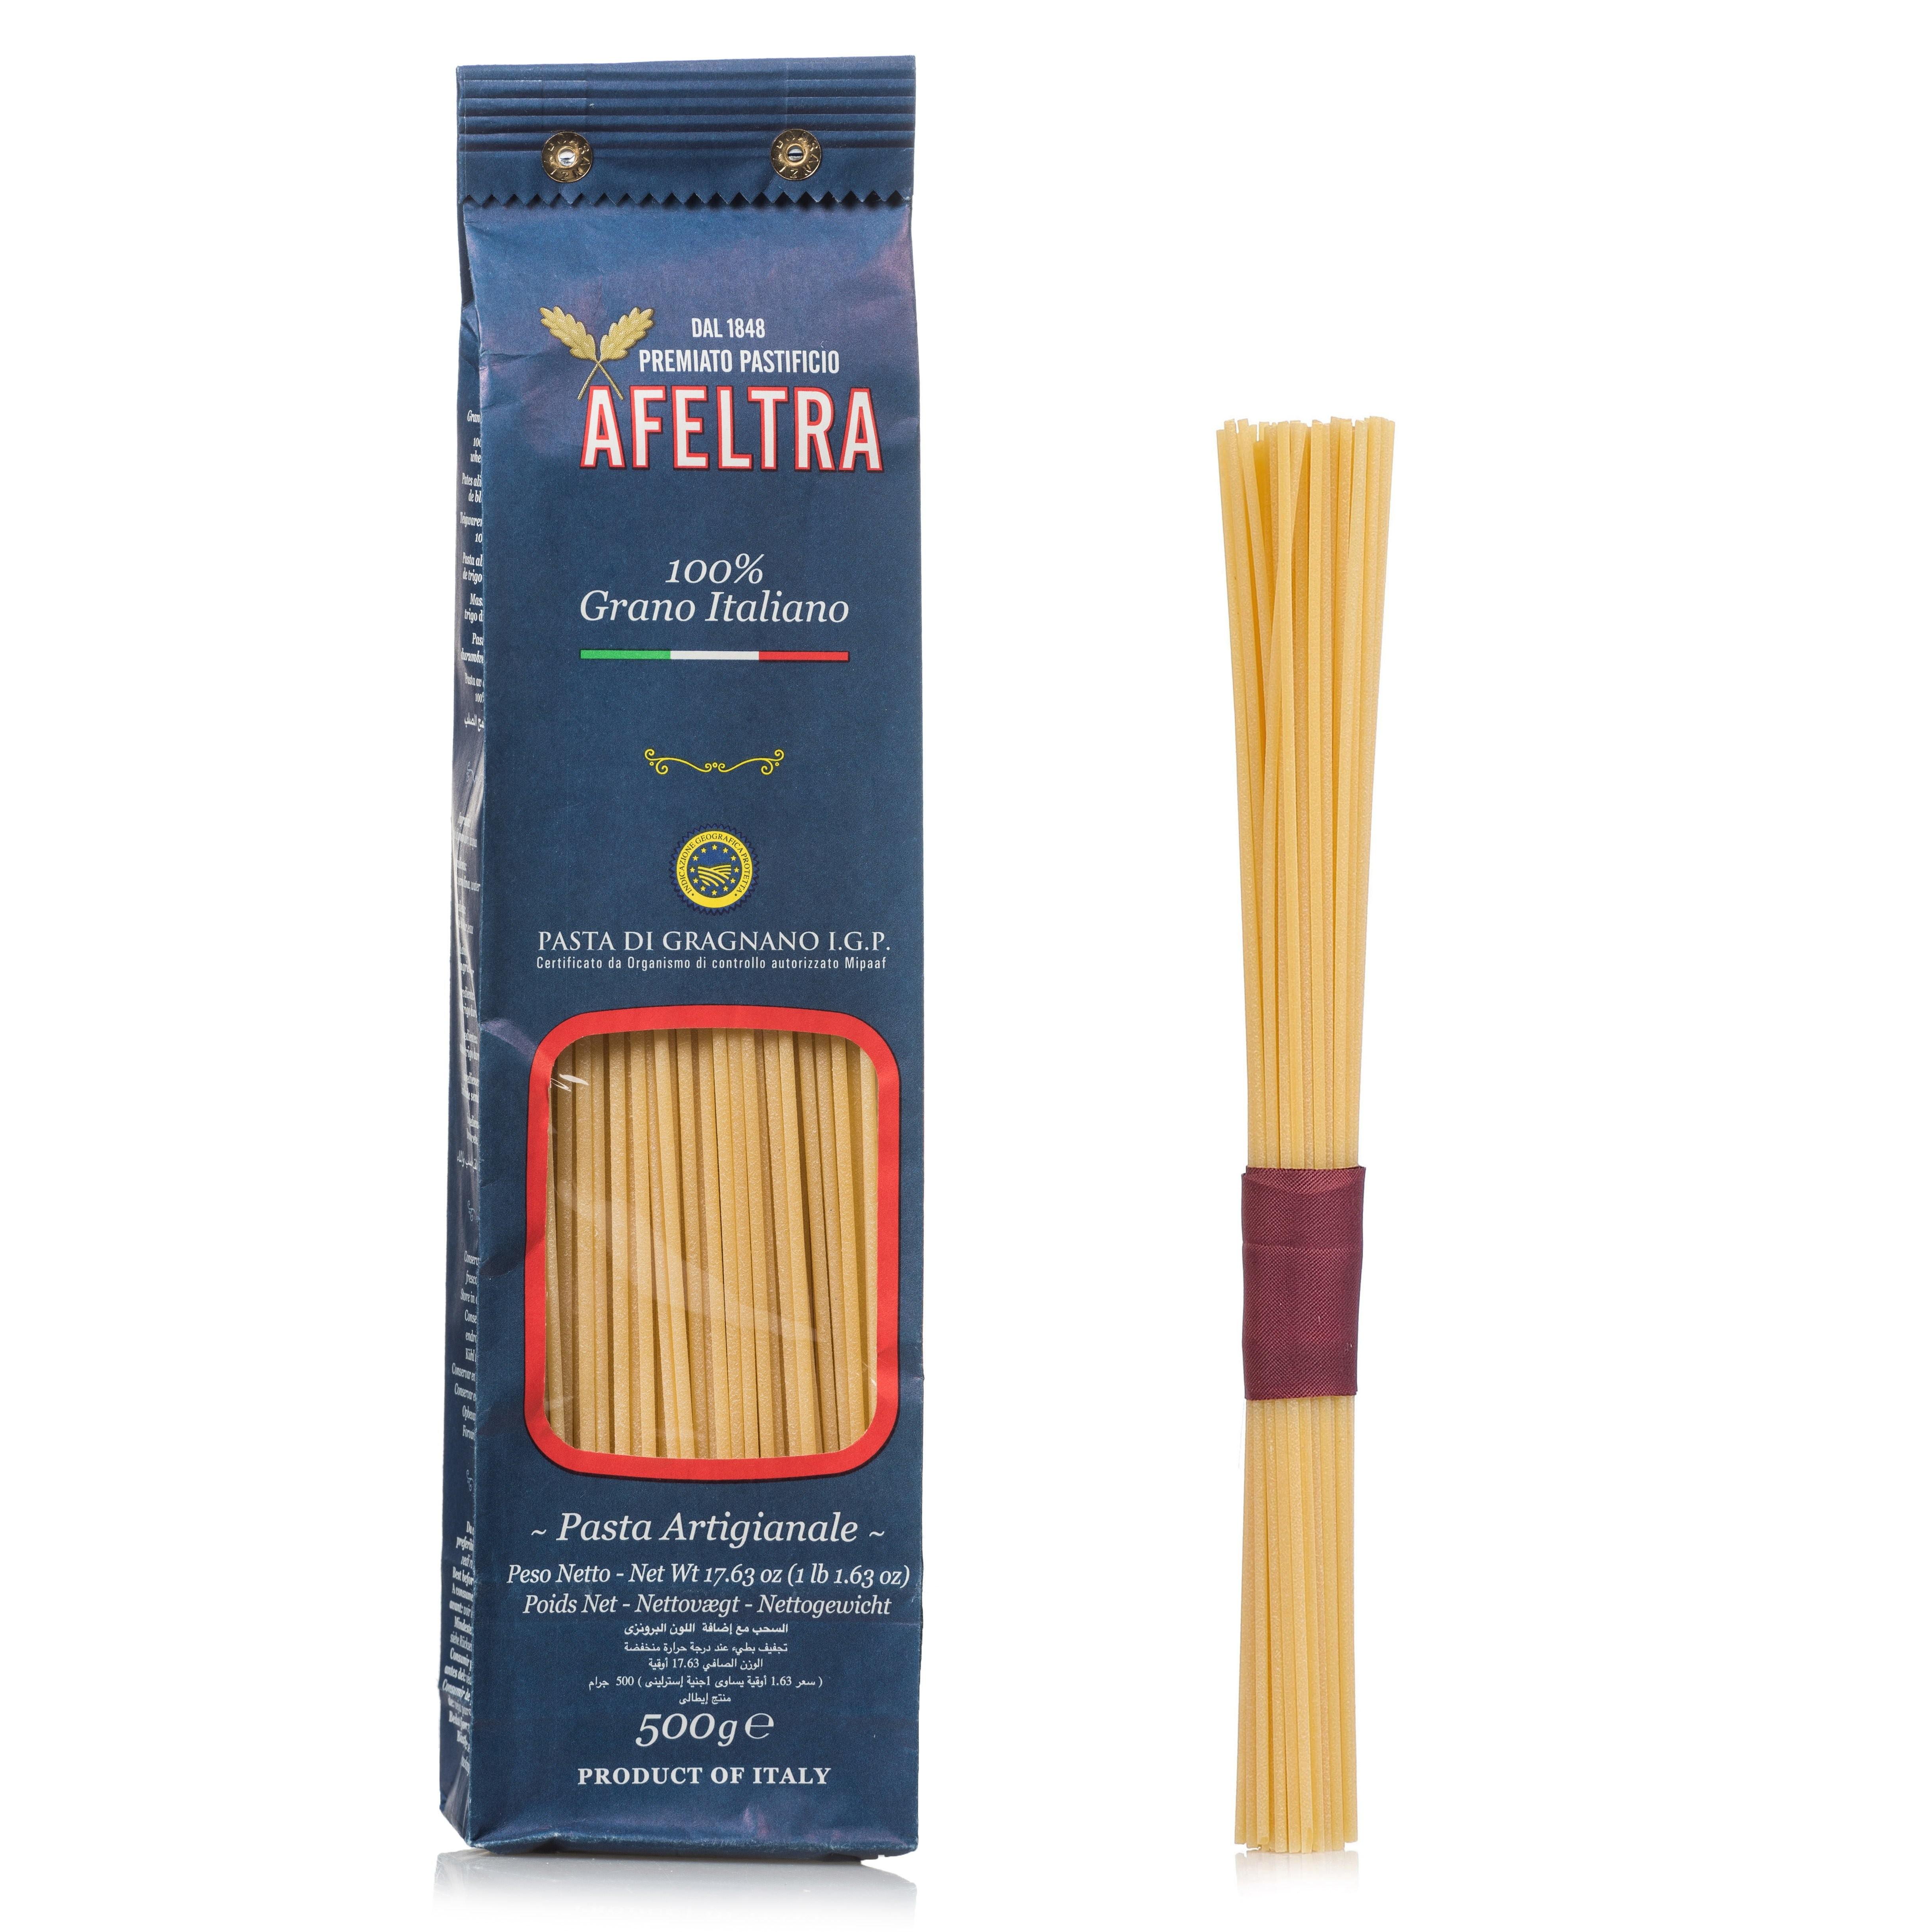 100% Italian Grain Spaghettone 17.6 oz